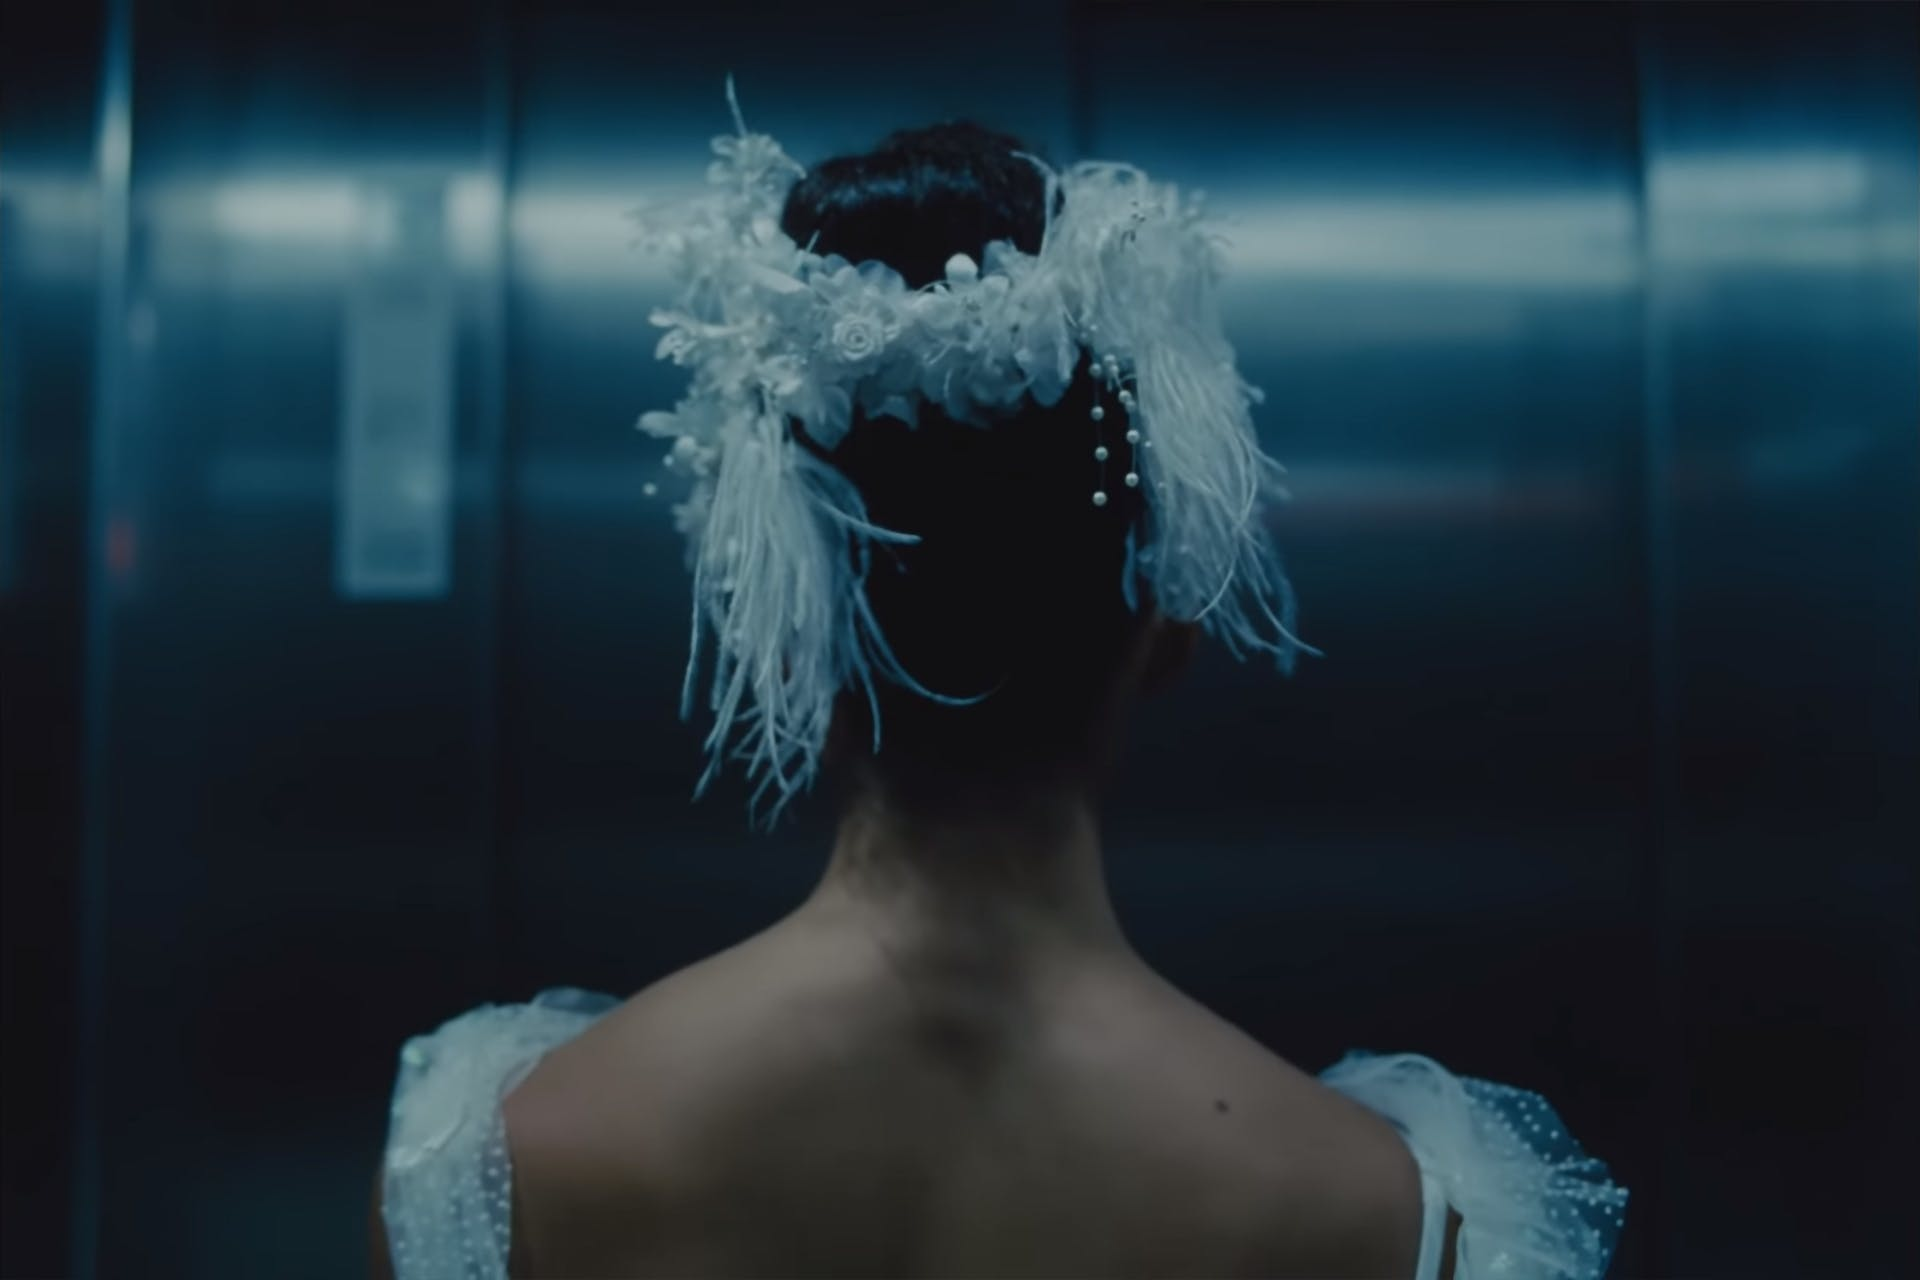 Amazon Christmas ad starring a ballerina